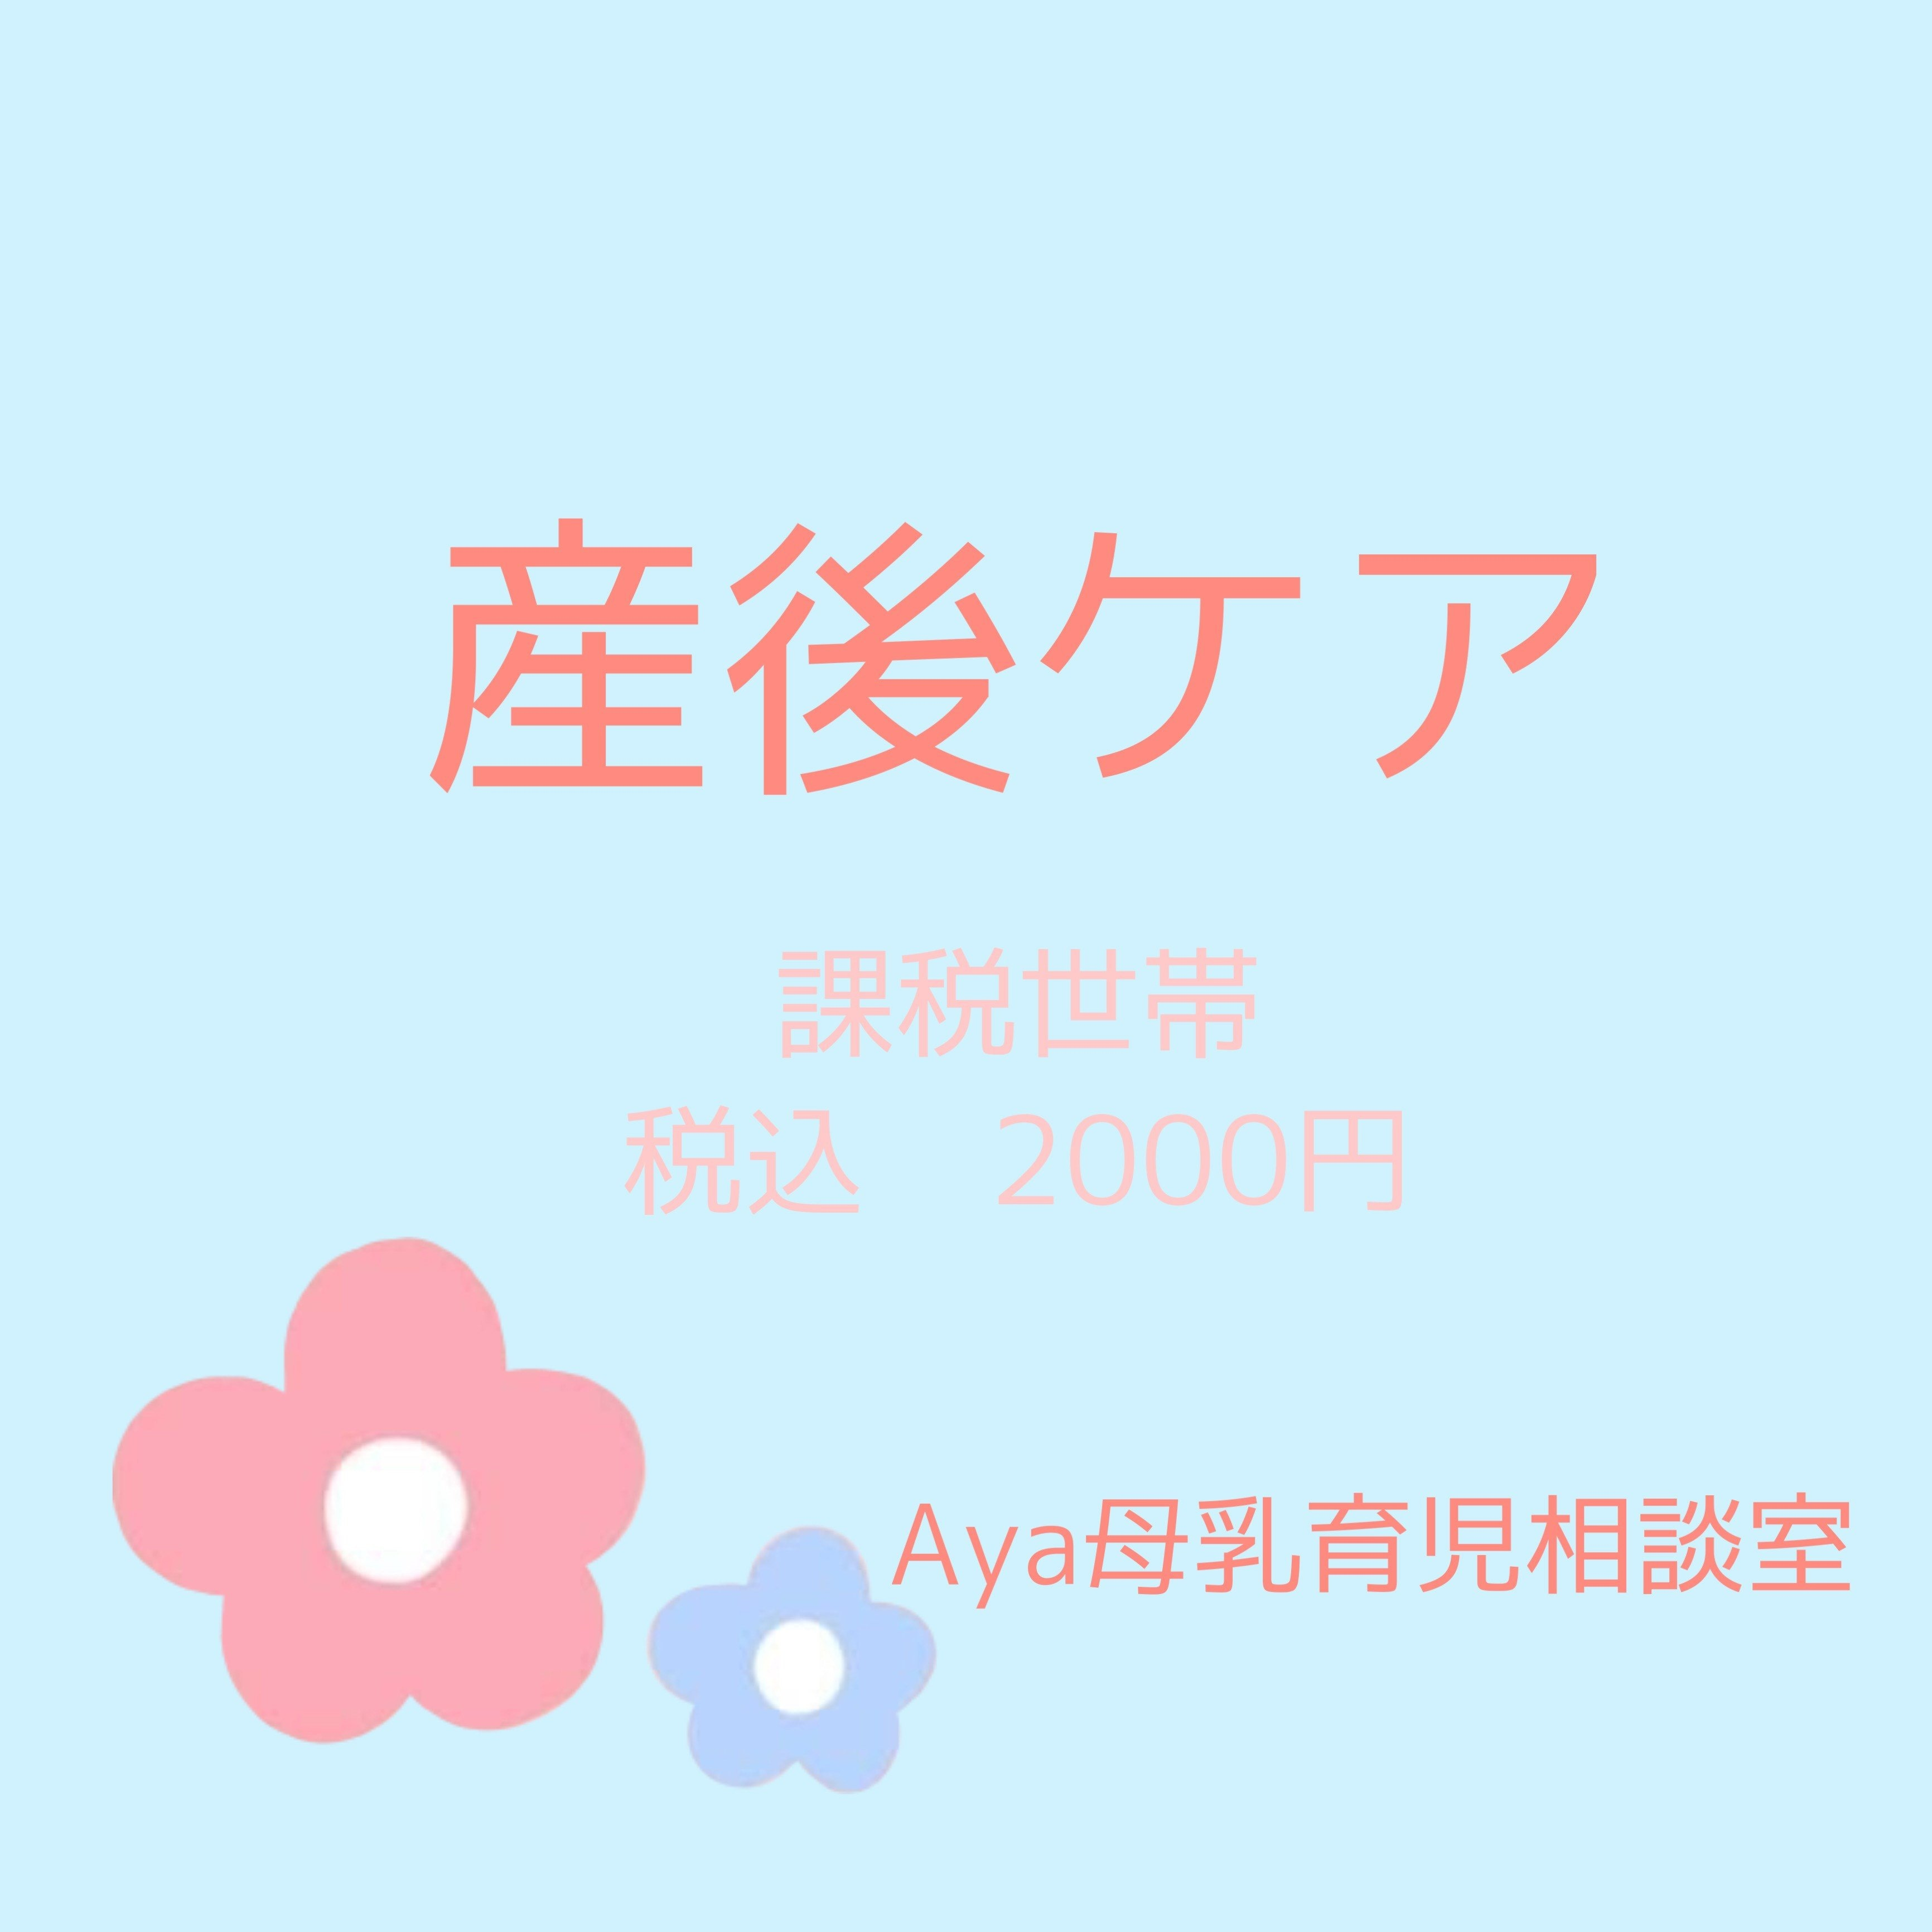 Aya母乳育児相談室 産後ケア 2,000円(税込) 現地払いのイメージその1